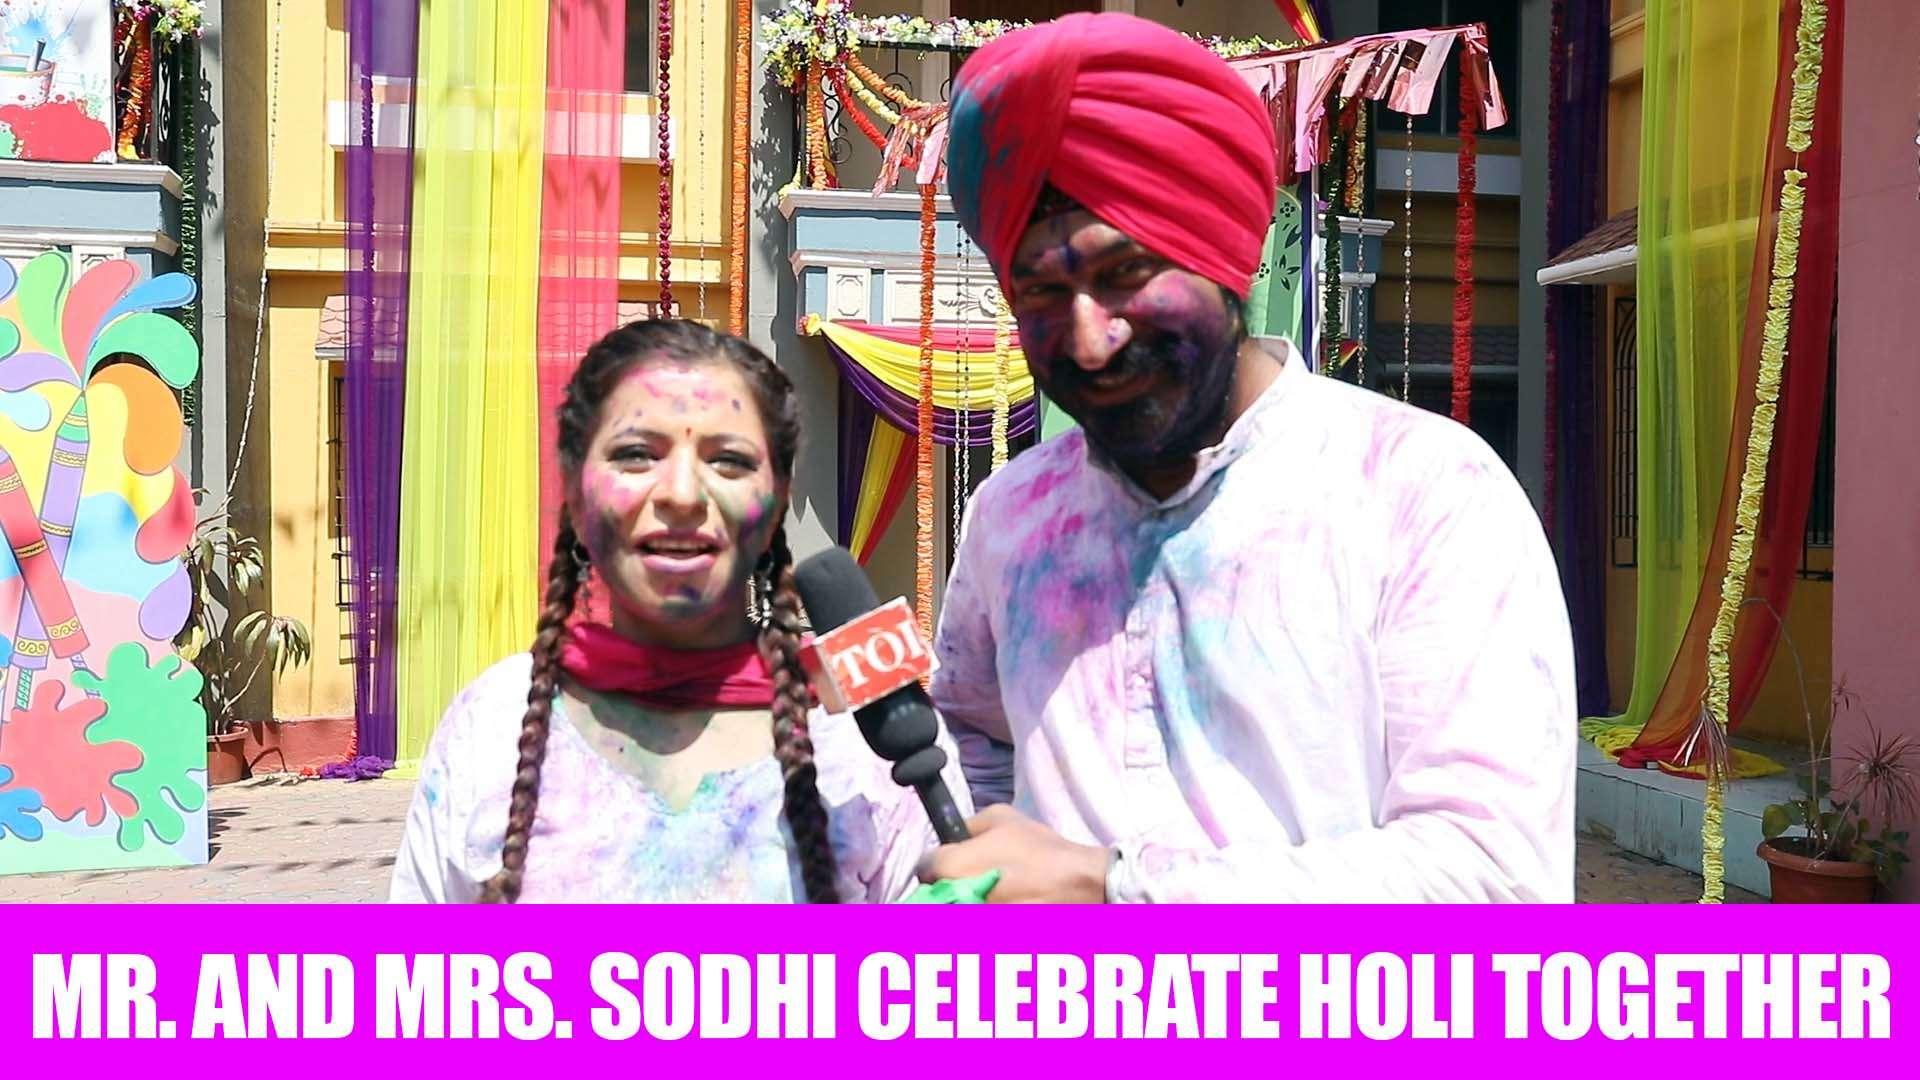 Taarak Mehta Ka Ooltah Chashmah: Holi fever grips Mr  and Mrs  Sodhi